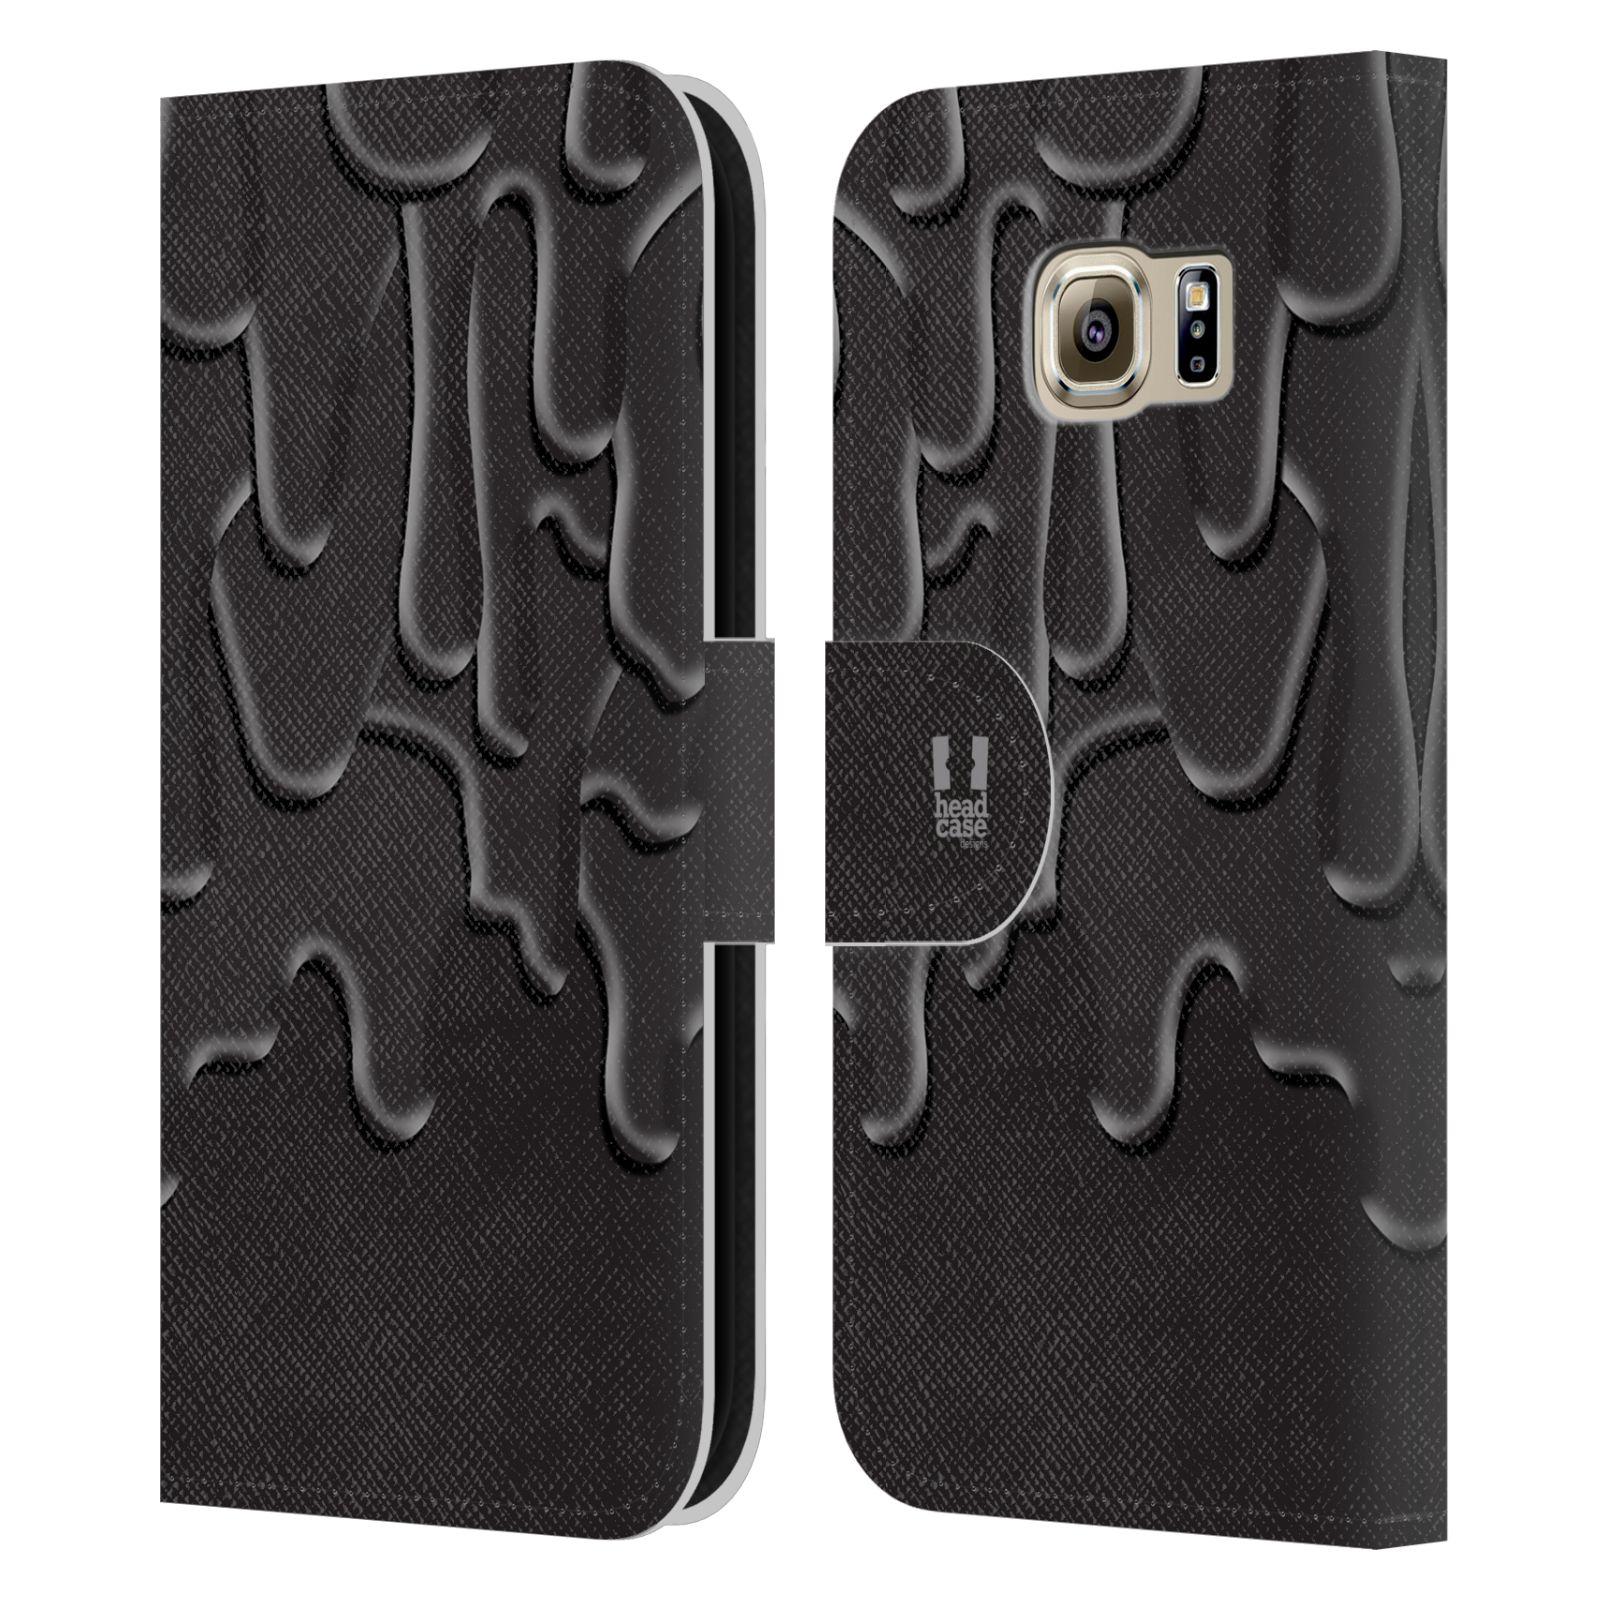 HEAD CASE Flipové pouzdro pro mobil Samsung Galaxy S6 (G9200) ZÁPLAVA BARVA černá